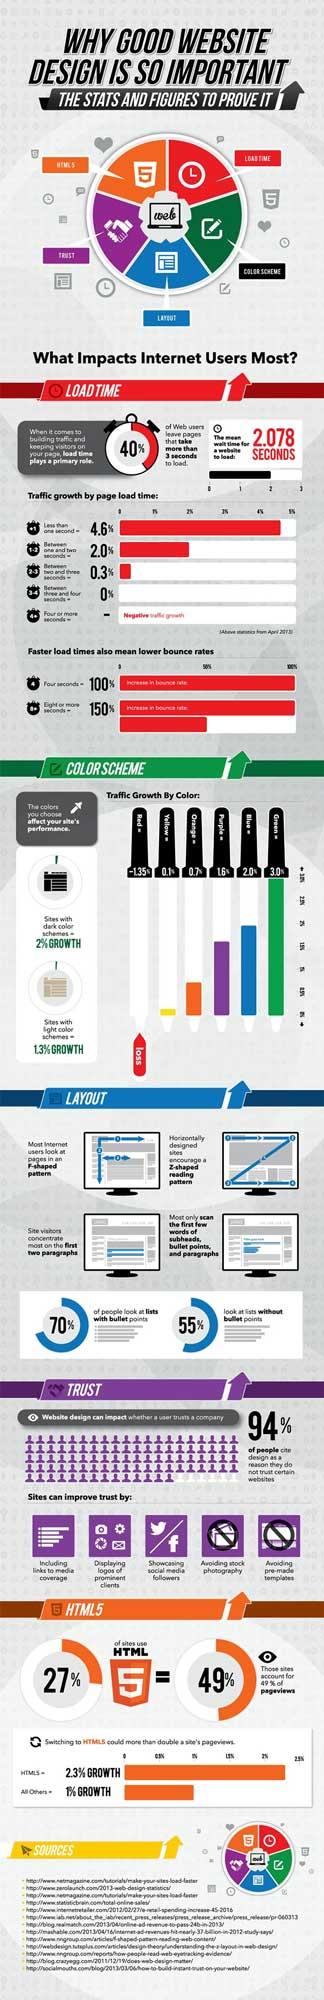 hubspot-website-infographic-.jpg